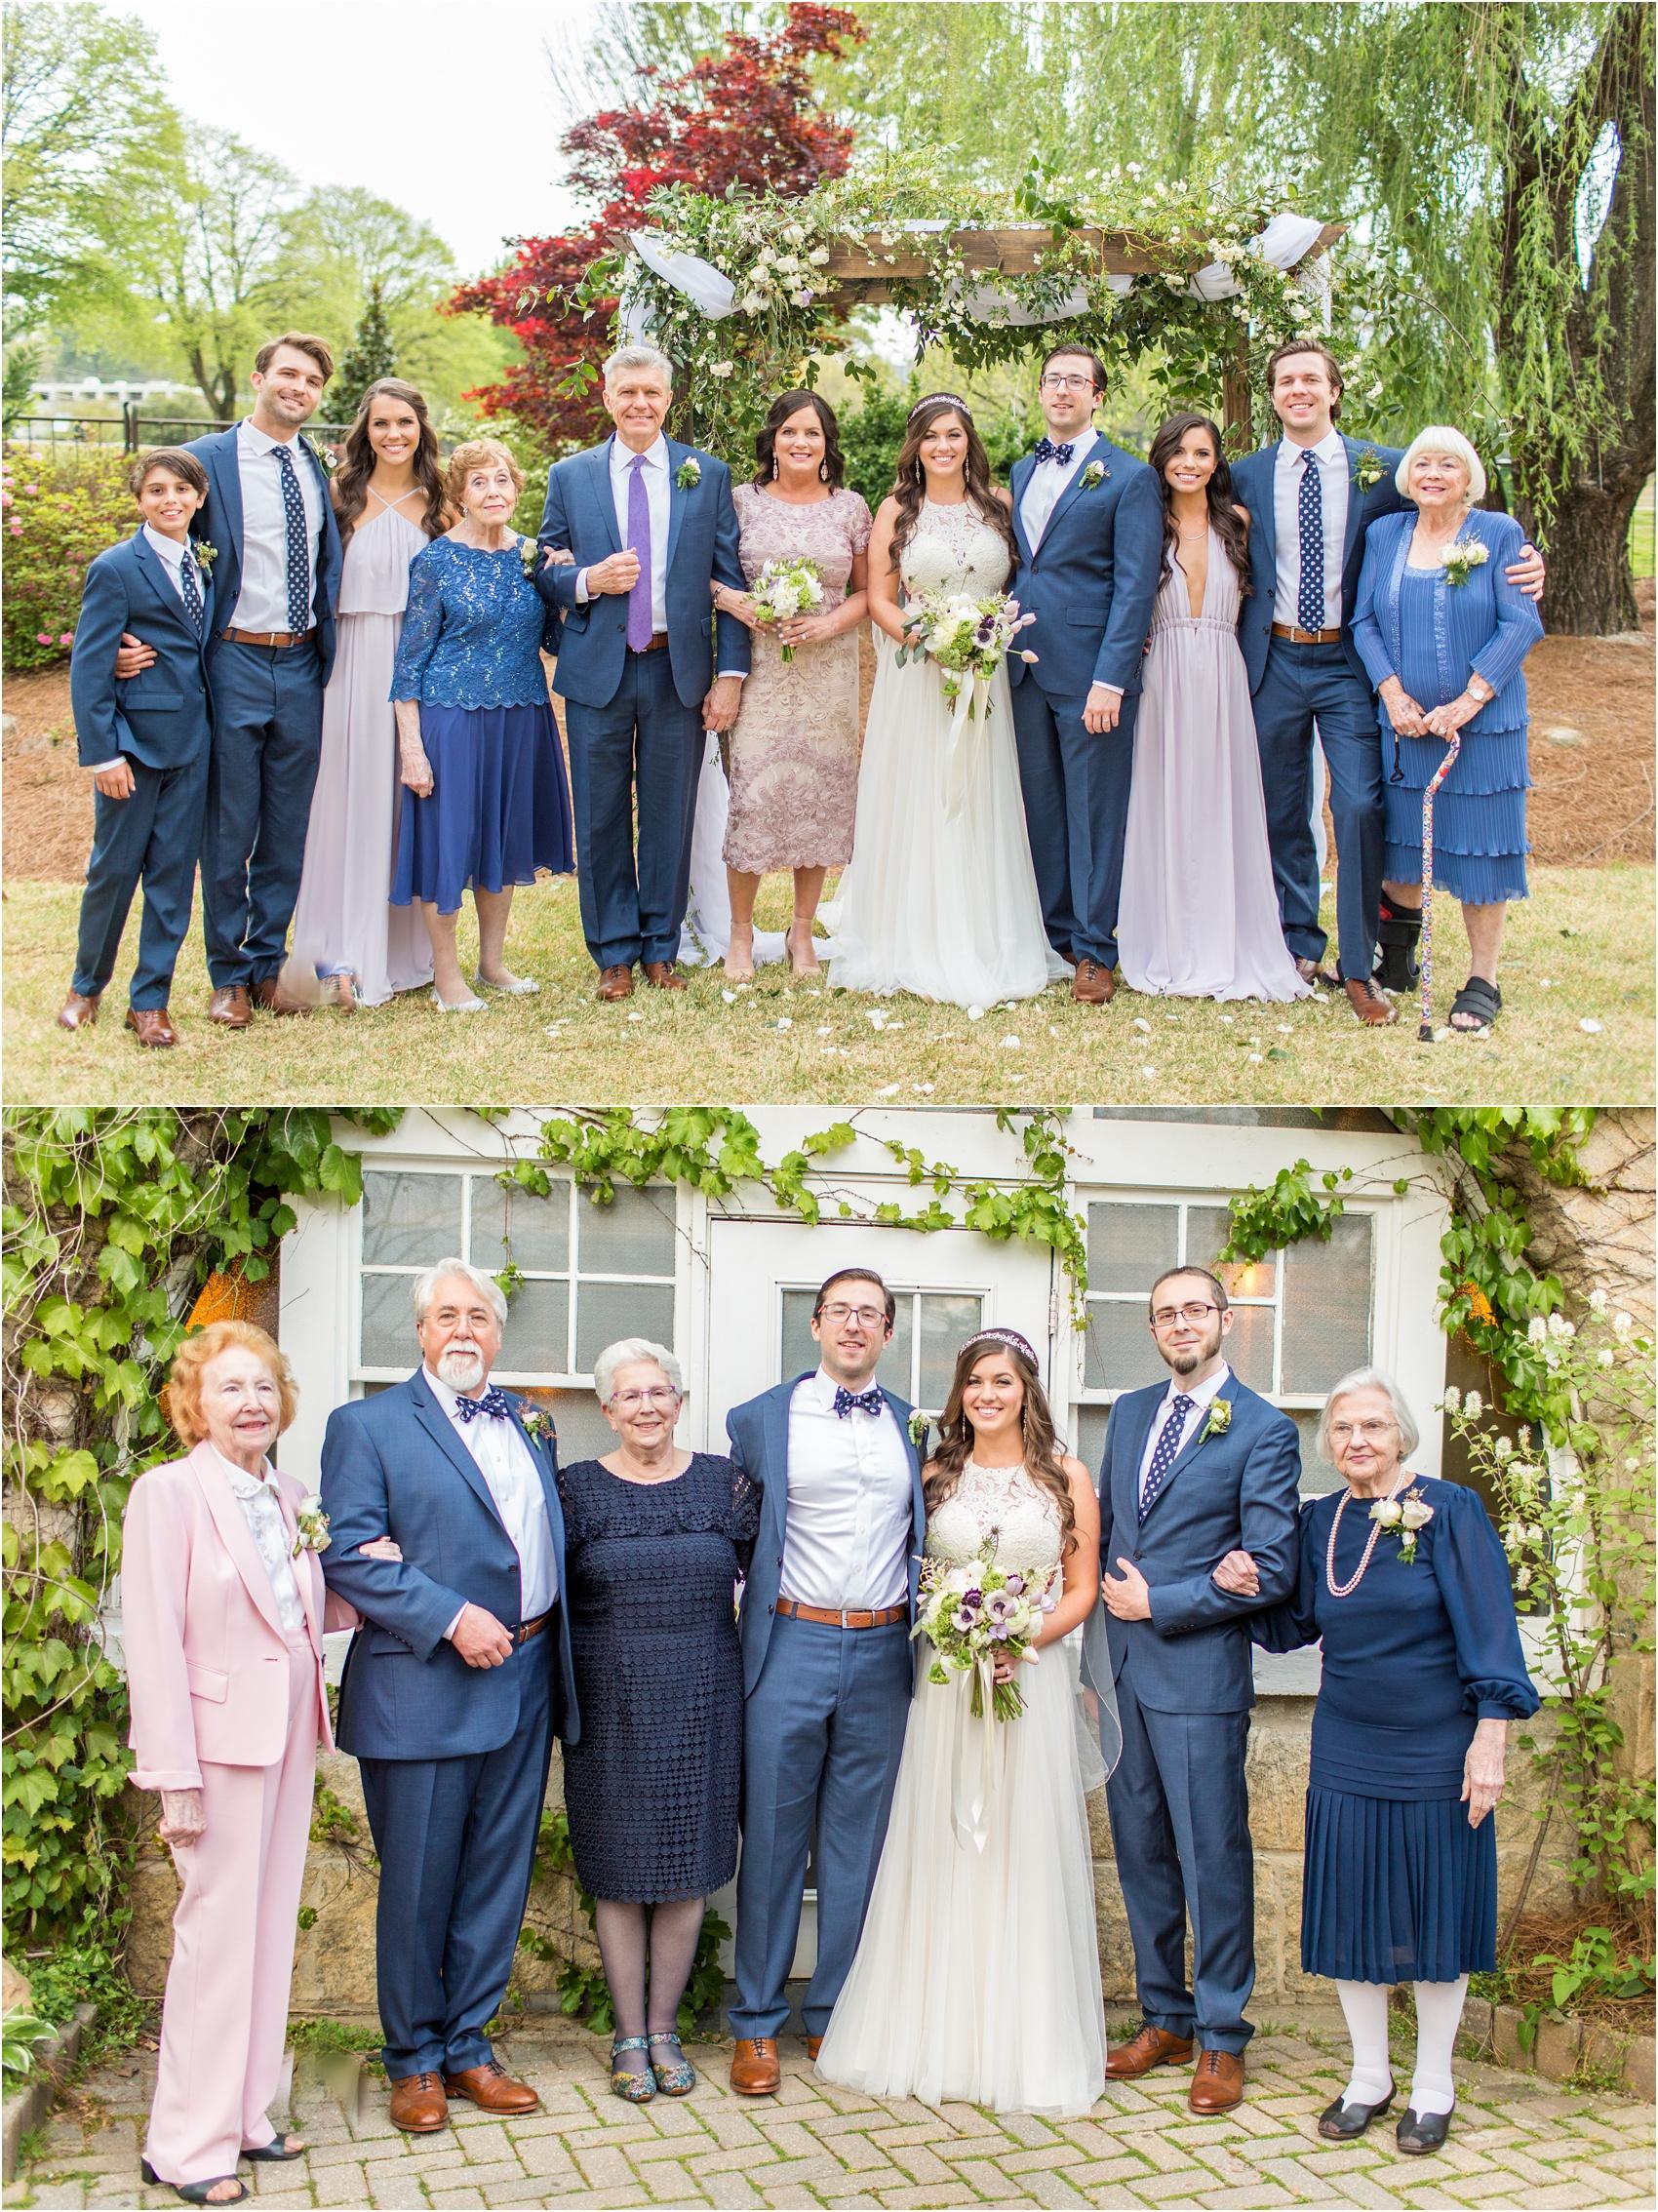 Savannah Eve Photography- Groseclose Wedding- Blog-78.jpg